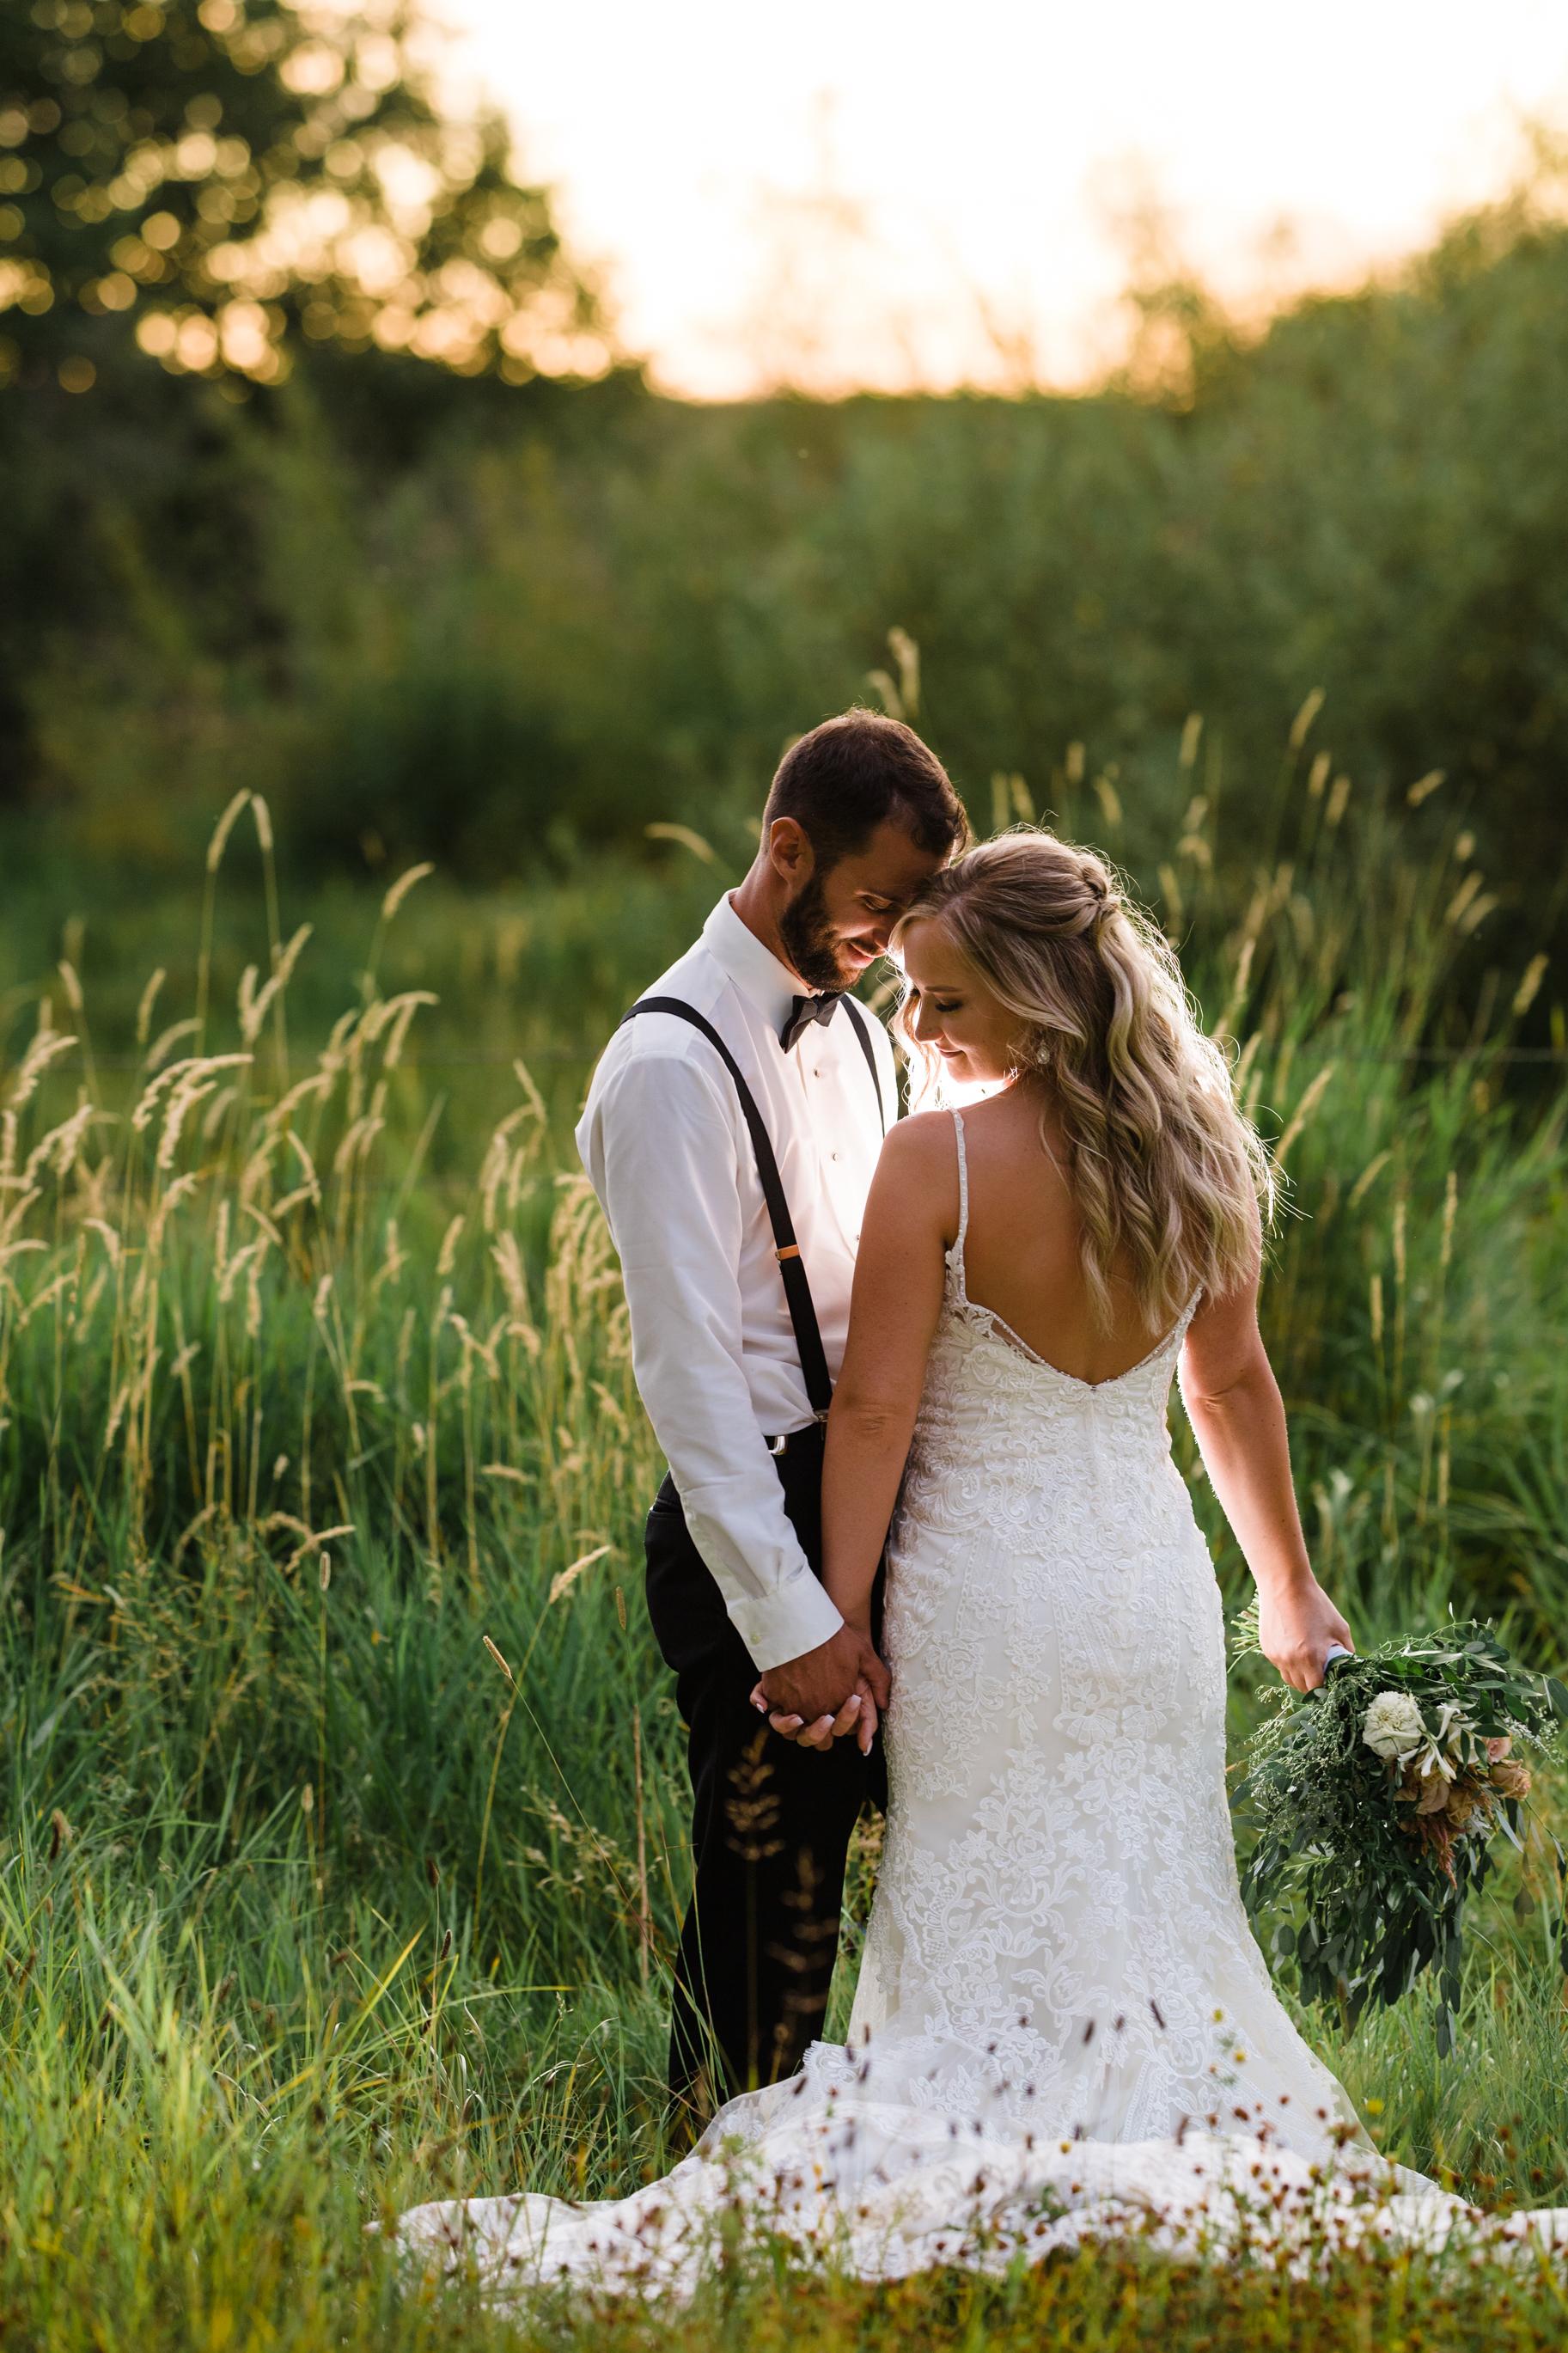 067Sky Ridge Ranch Wedding_Montana Wedding Photographer_Jessica & Brian_Honeybee Weddings_August 24, 2019-38.jpg